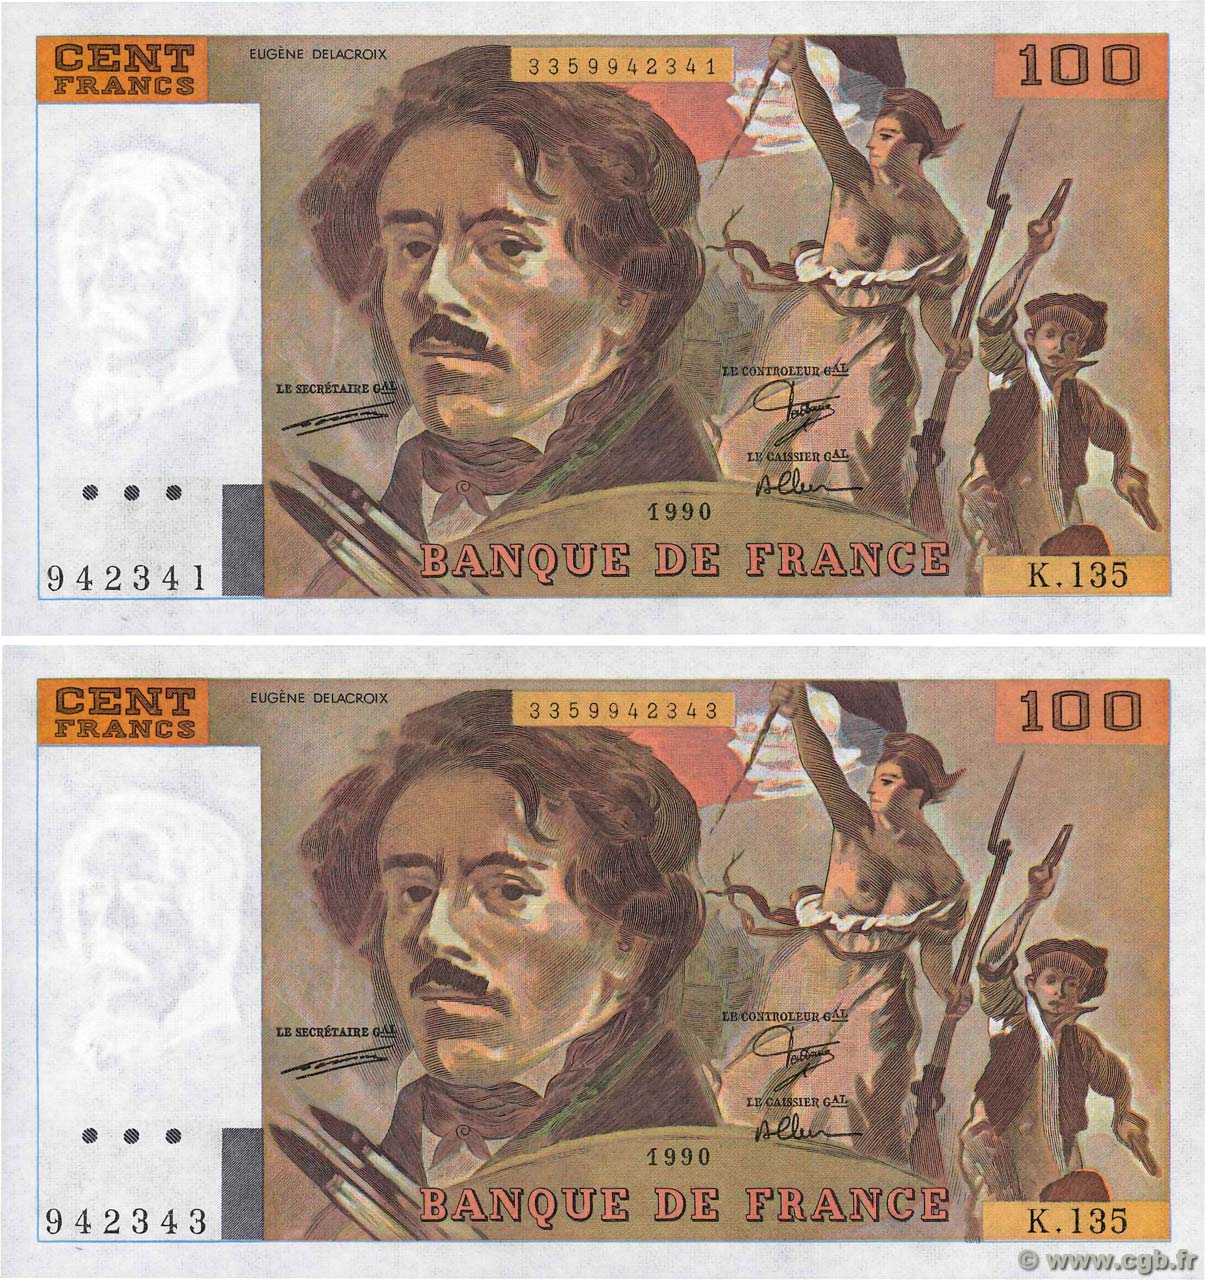 billet de banque 100 francs delacroix